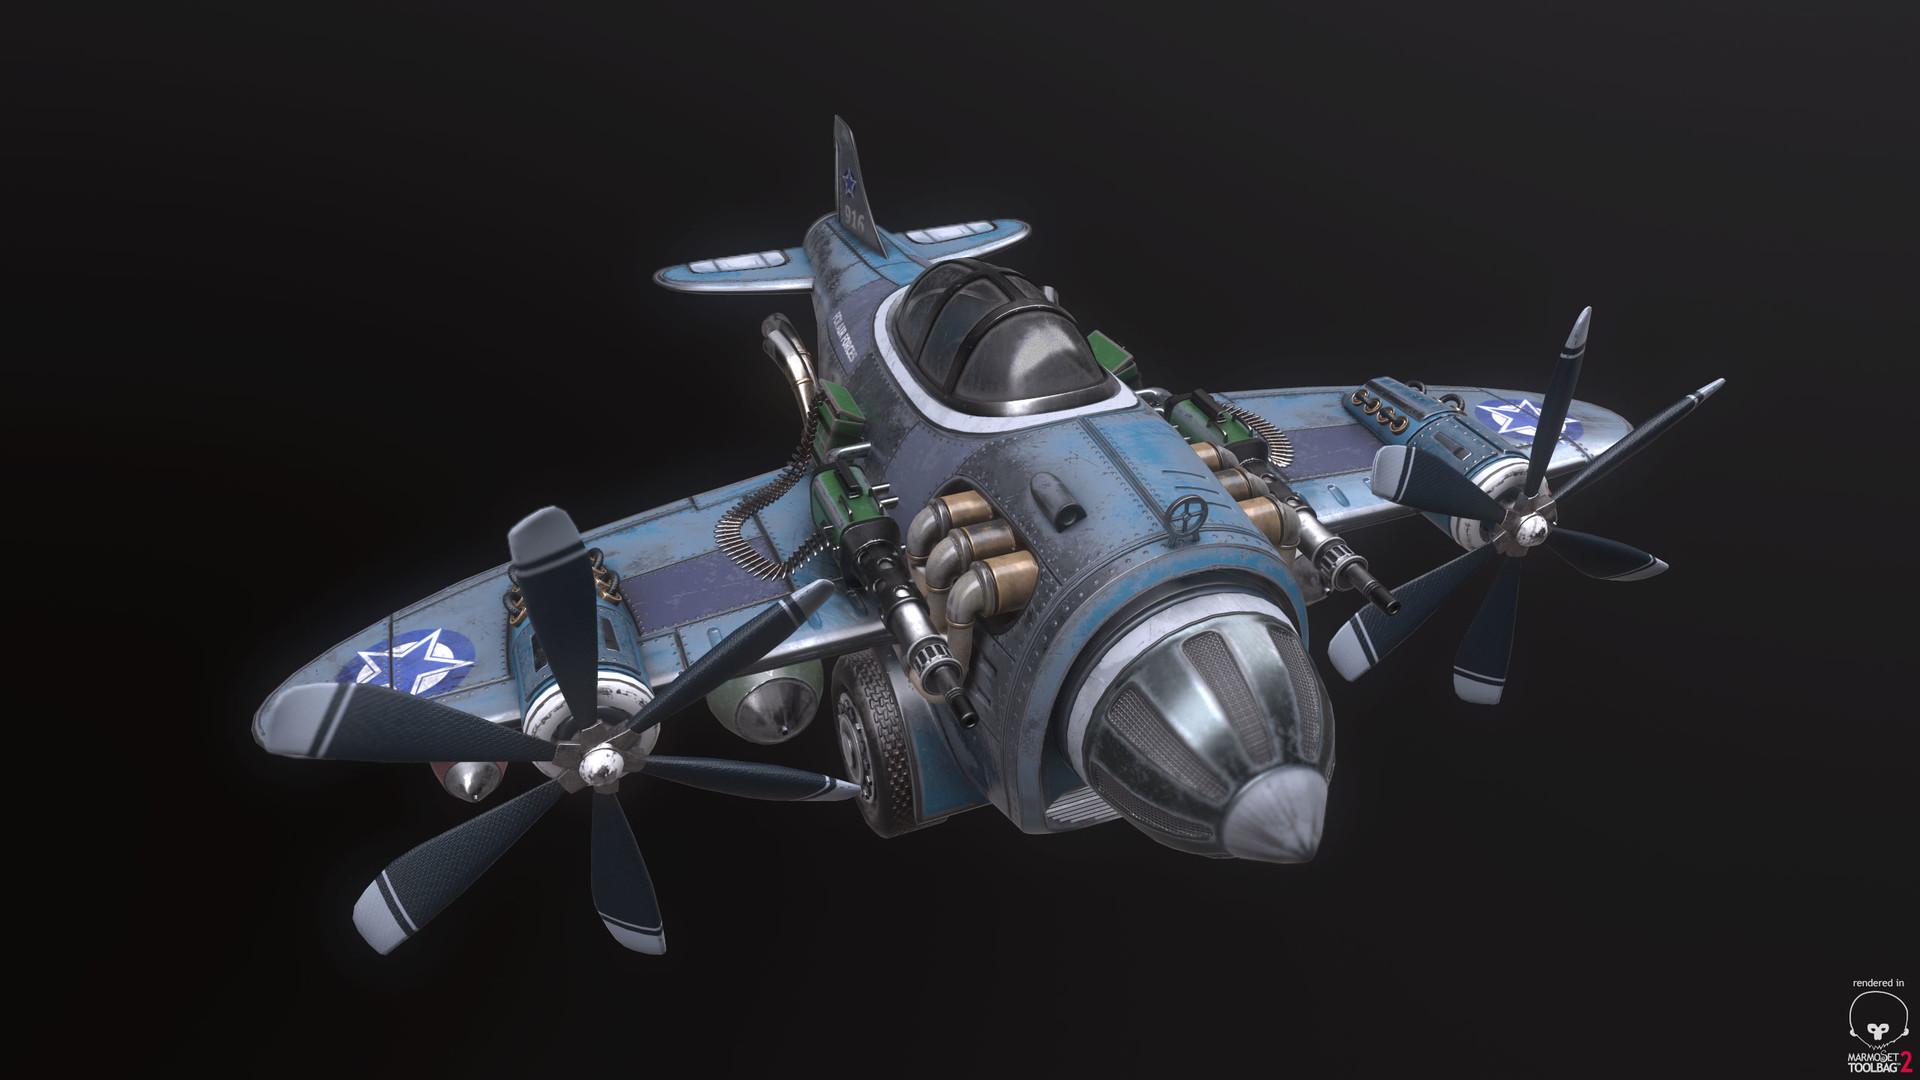 Andrey lukashov planes12